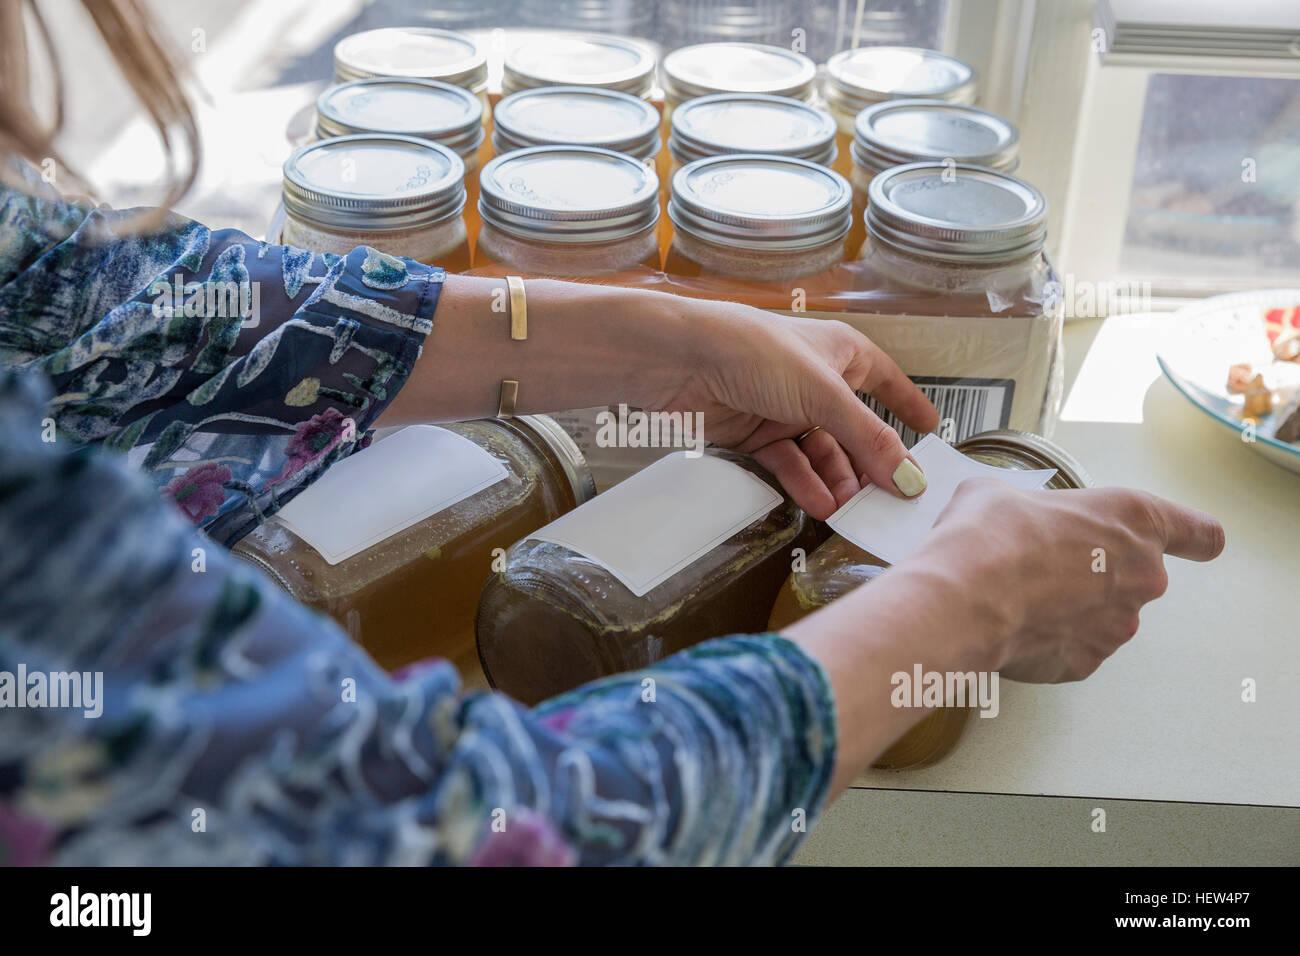 Women labelling jars - Stock Image